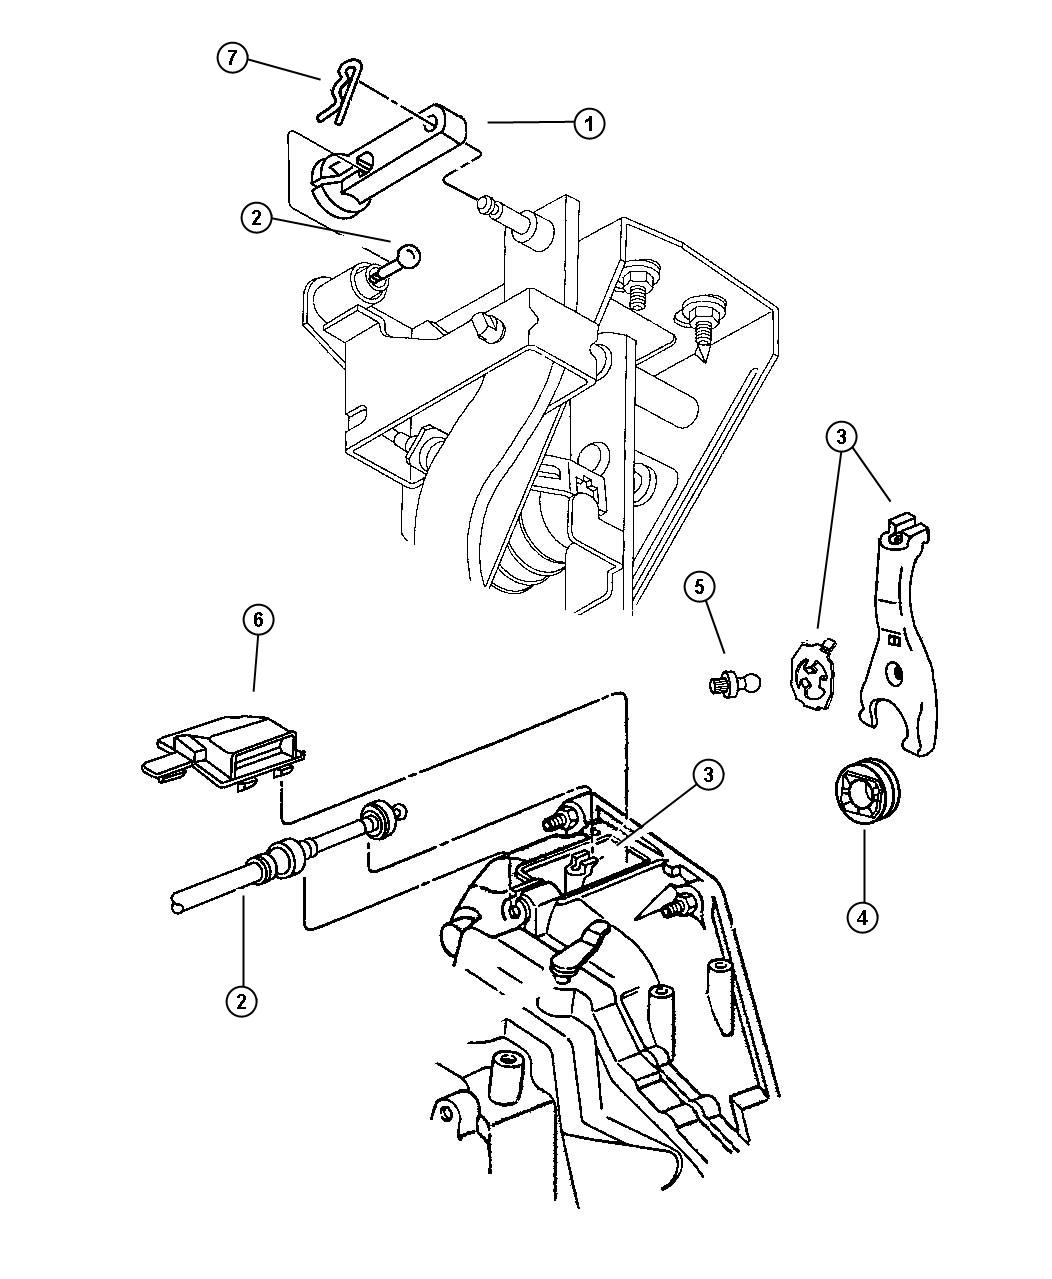 1999 Durango Alternator Wire Harness. Diagram. Auto Wiring